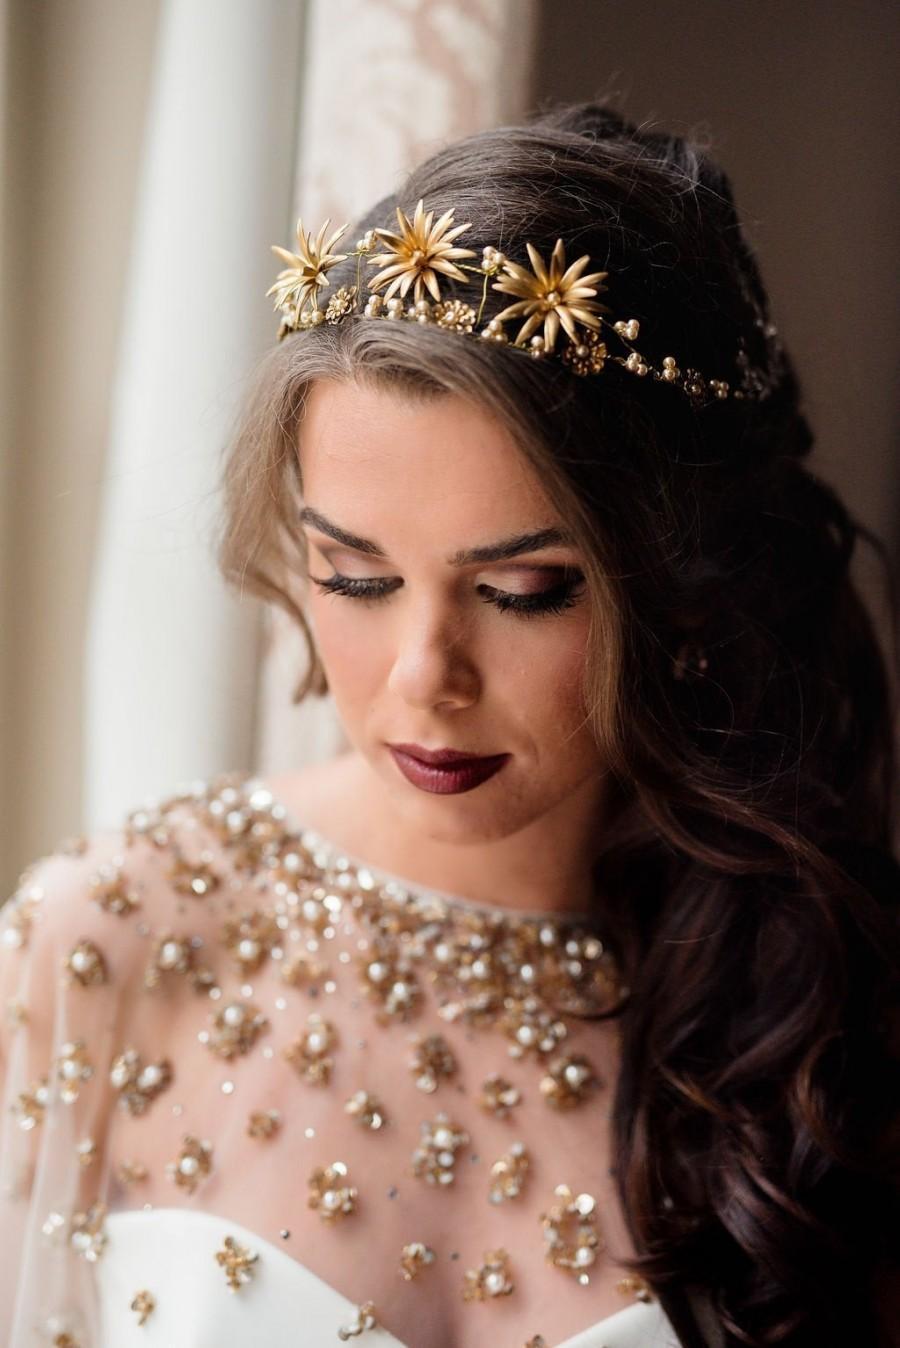 Wedding - Gold Metal Flower Crown Vintage Brass Flower Tiara with Champagne Pearls Wedding Bridal Headpiece Celestial Wedding Headband